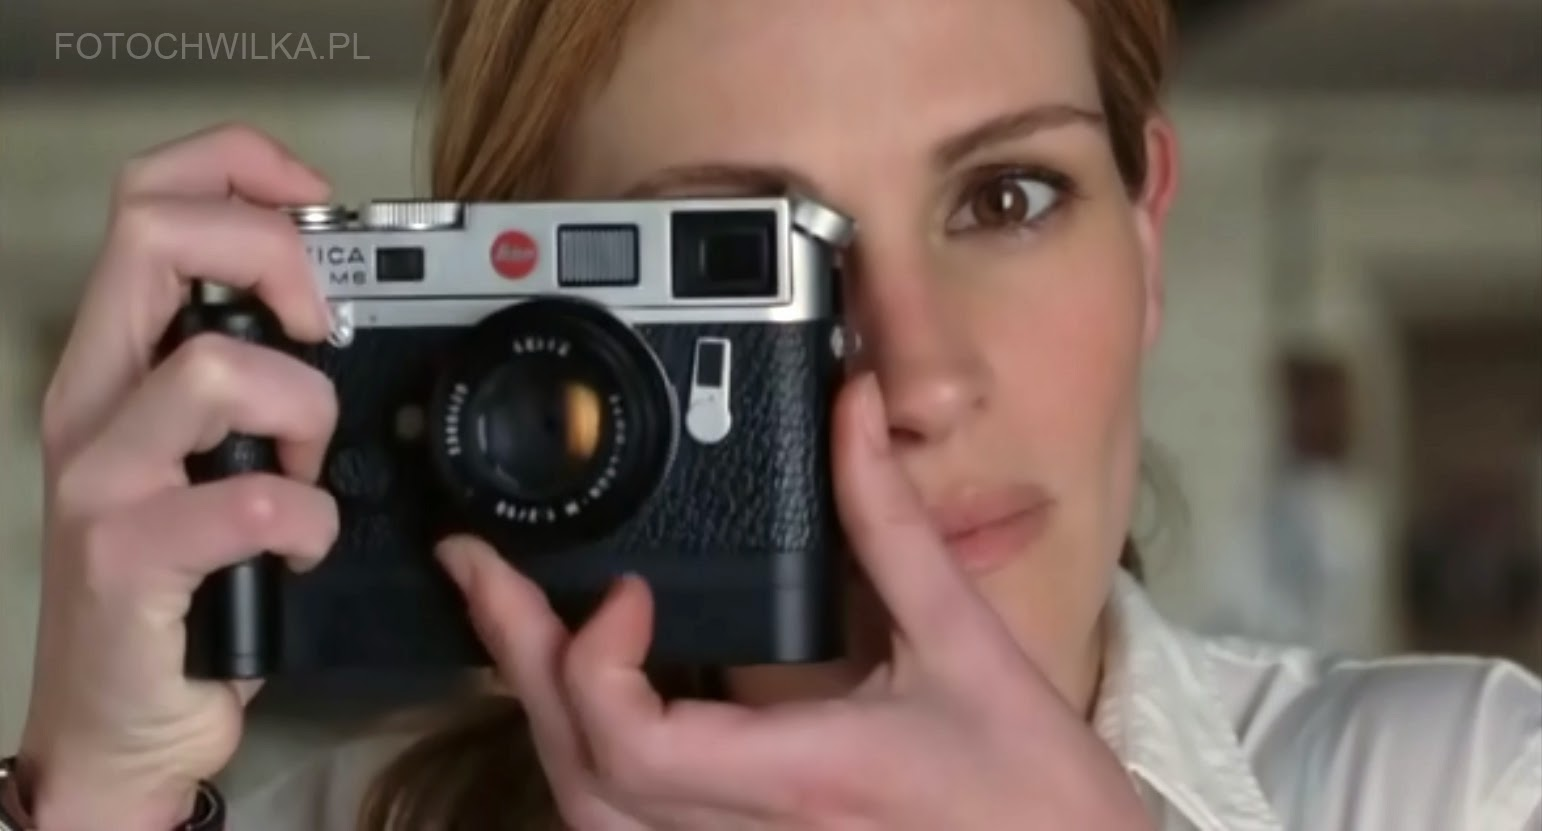 "Scena z filmu ""Bliżej"" (Closer) - Julia Roberst fotografuje Natalie Portman Leicą"